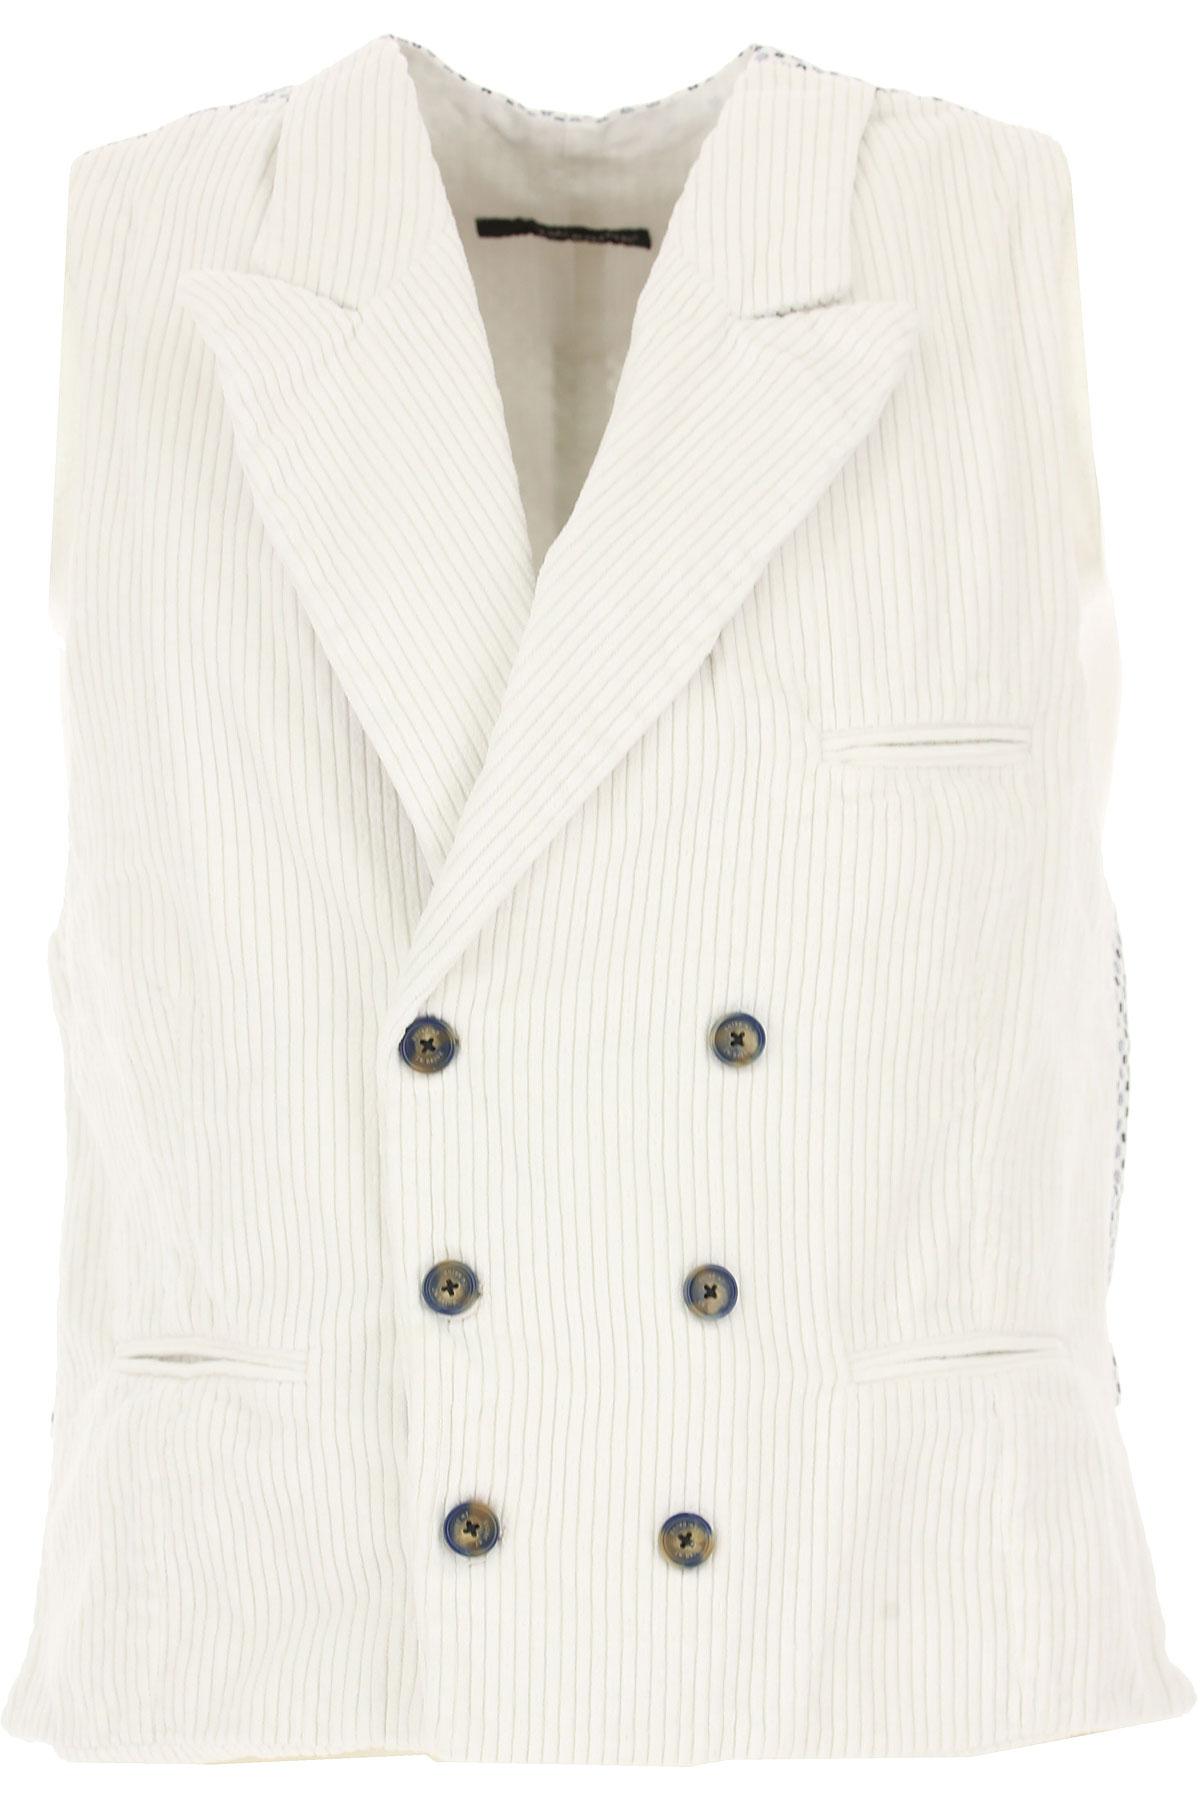 Image of J.W. Brine Mens Clothing, White, Cotton, 2017, L M XL